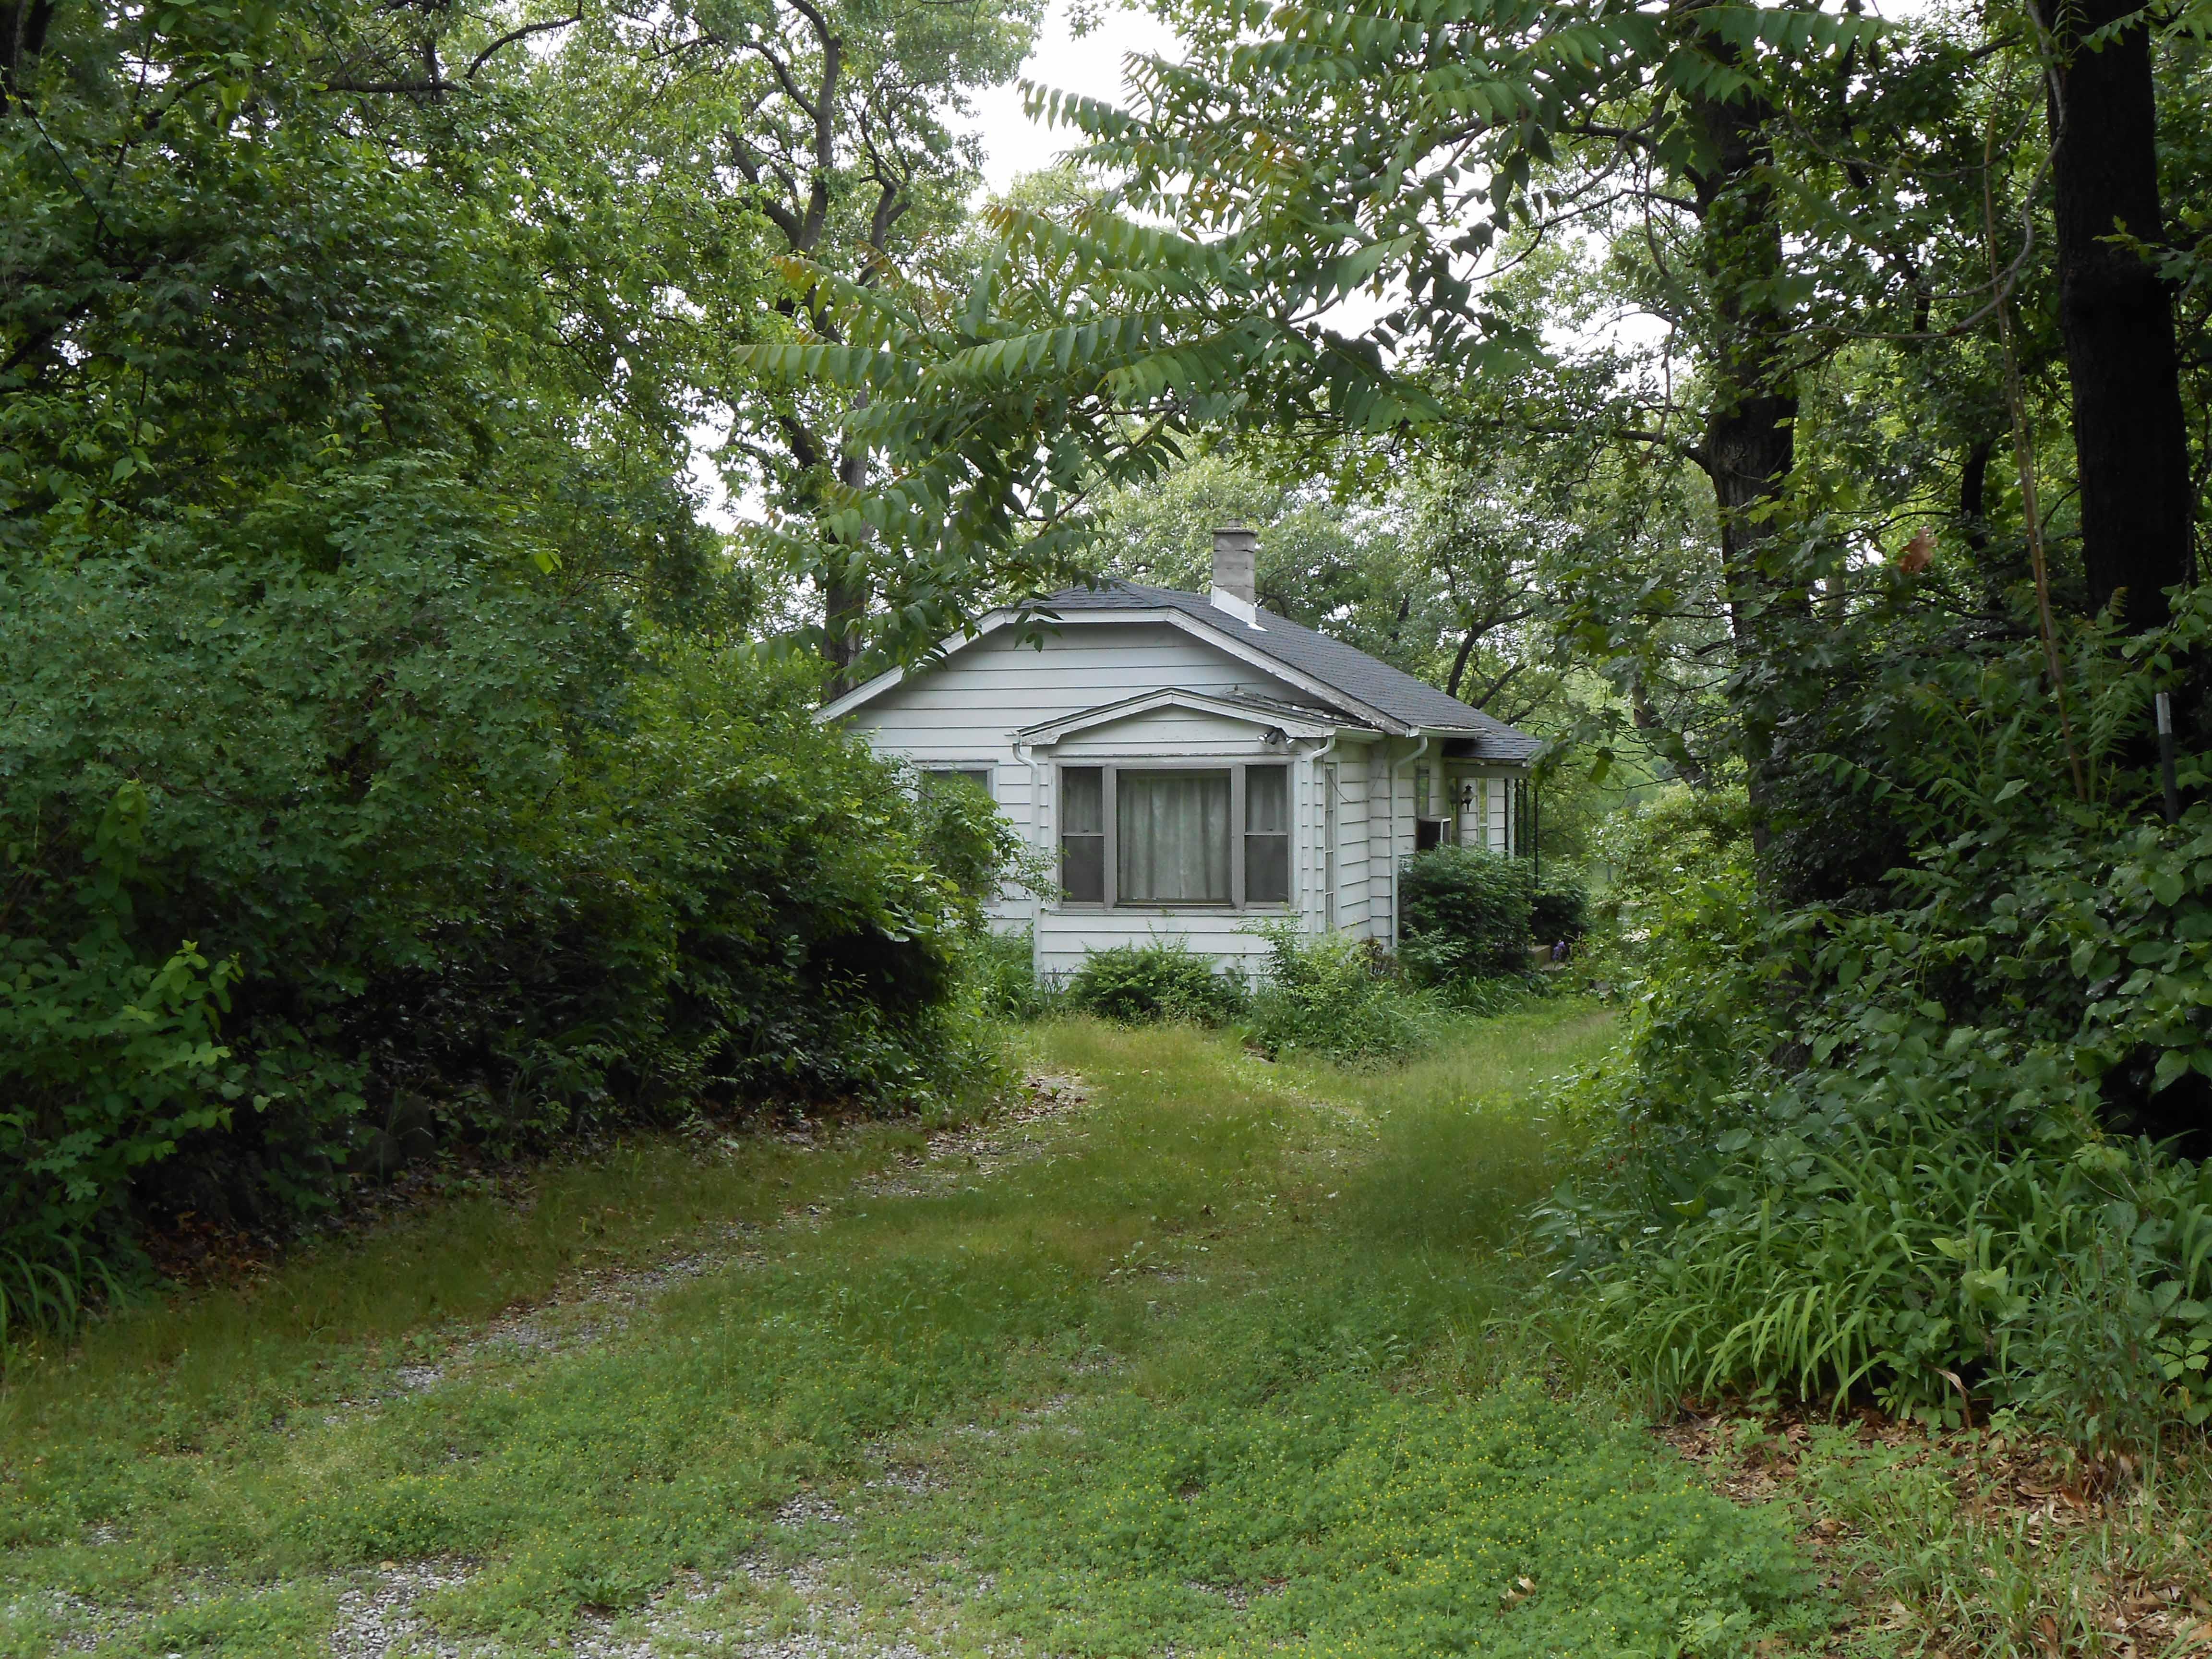 Nelson Algren cottage in the Miller neighborhood of Gary, IN.